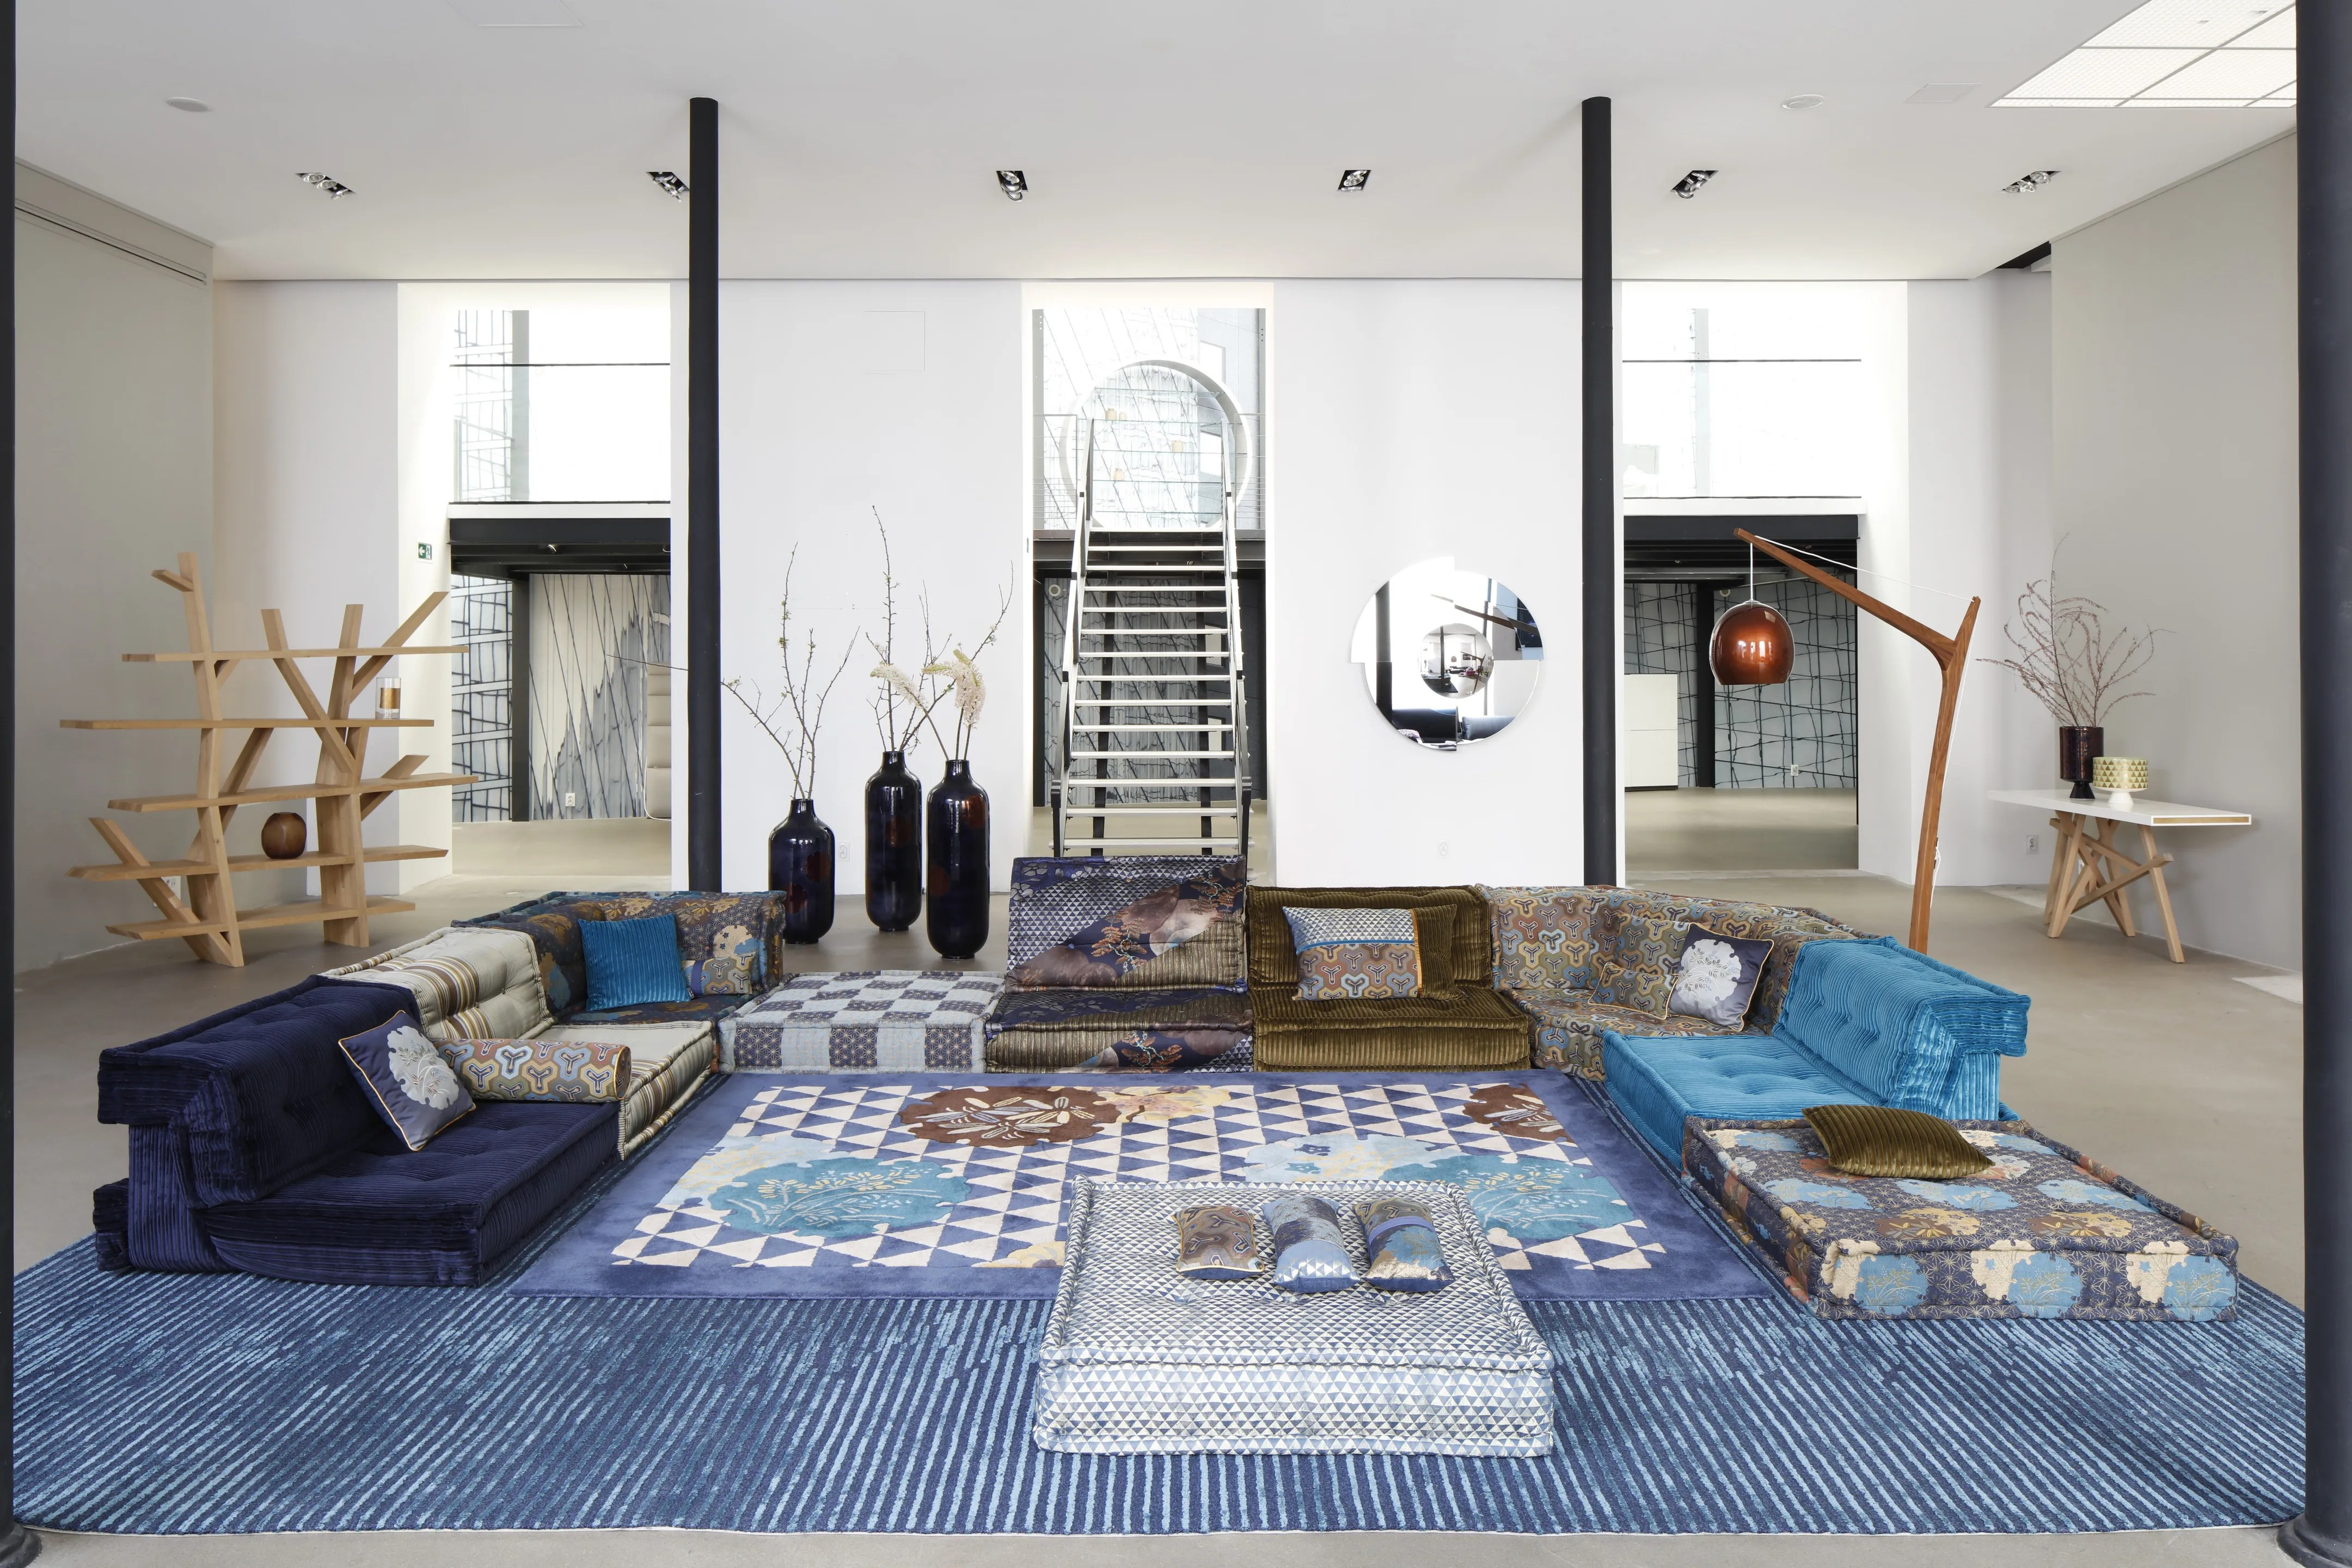 Kenzo Takada Reimagines an Iconic Roche Bobois Sofa